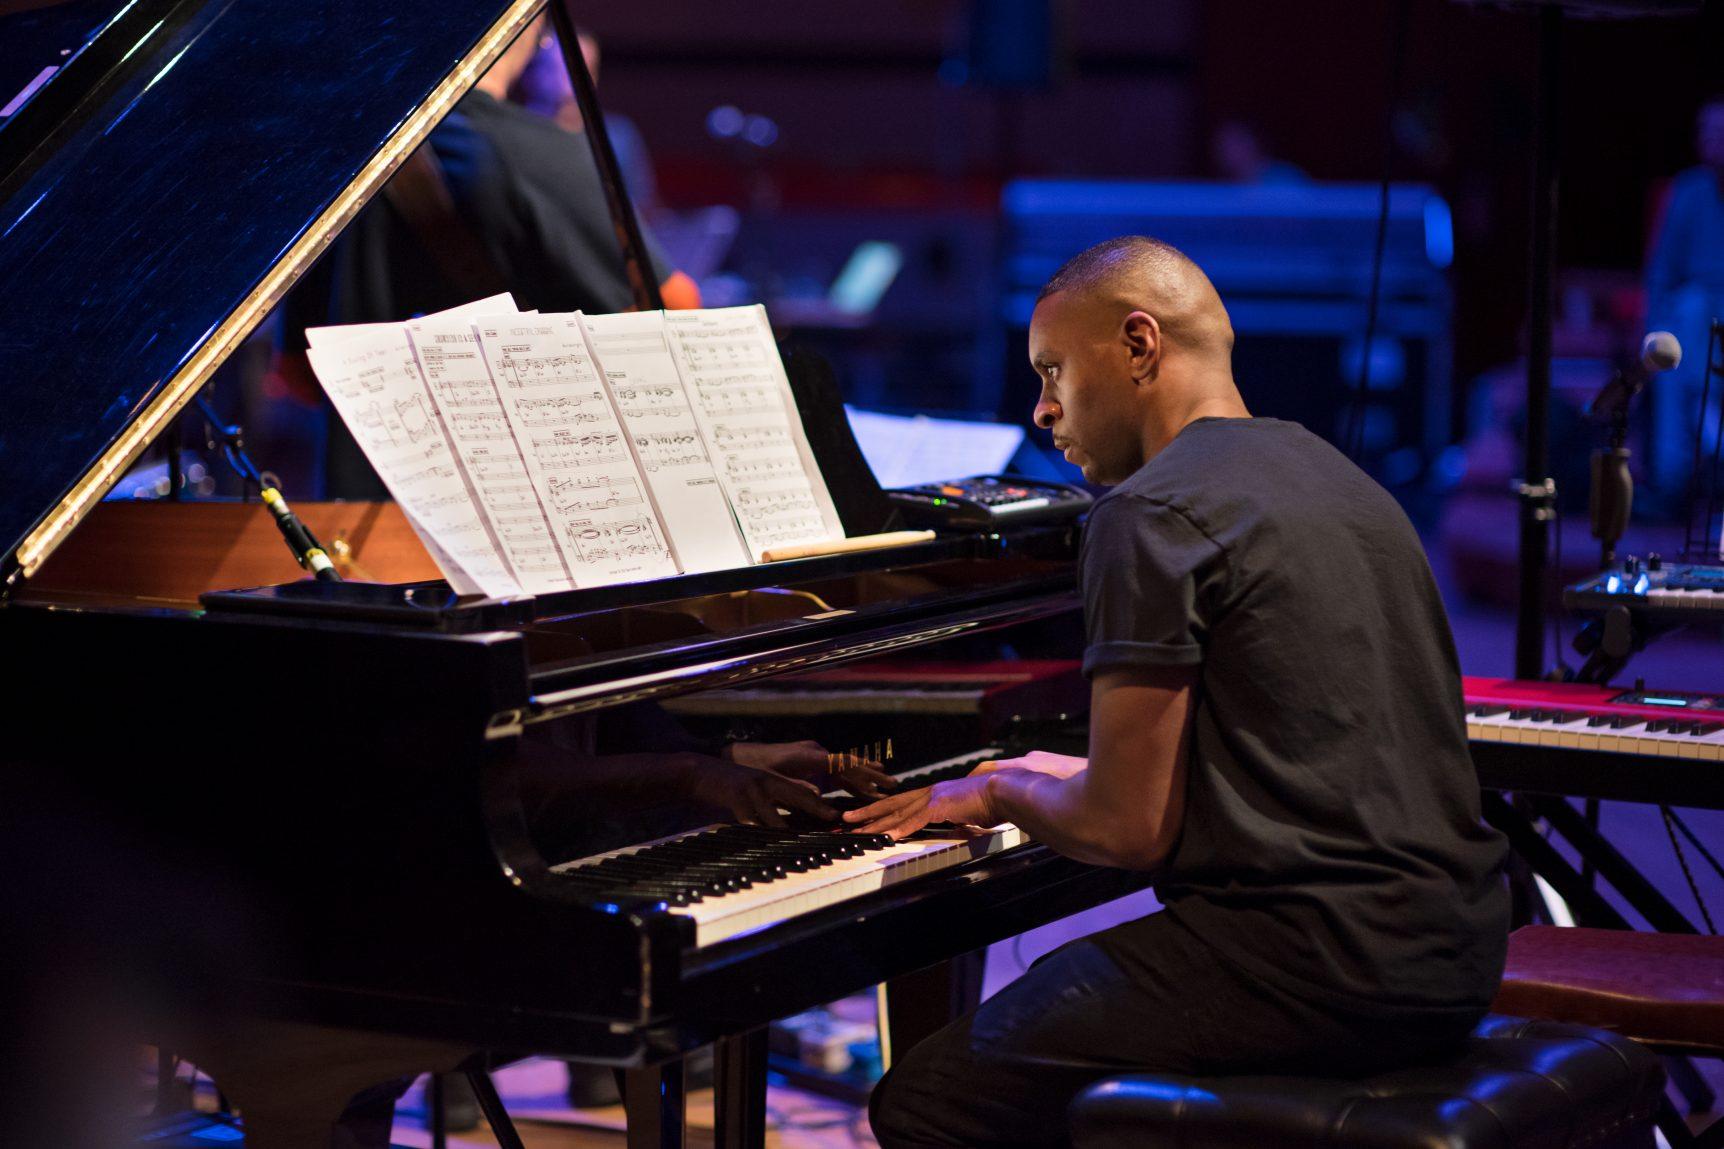 David Austin Grey playing piano